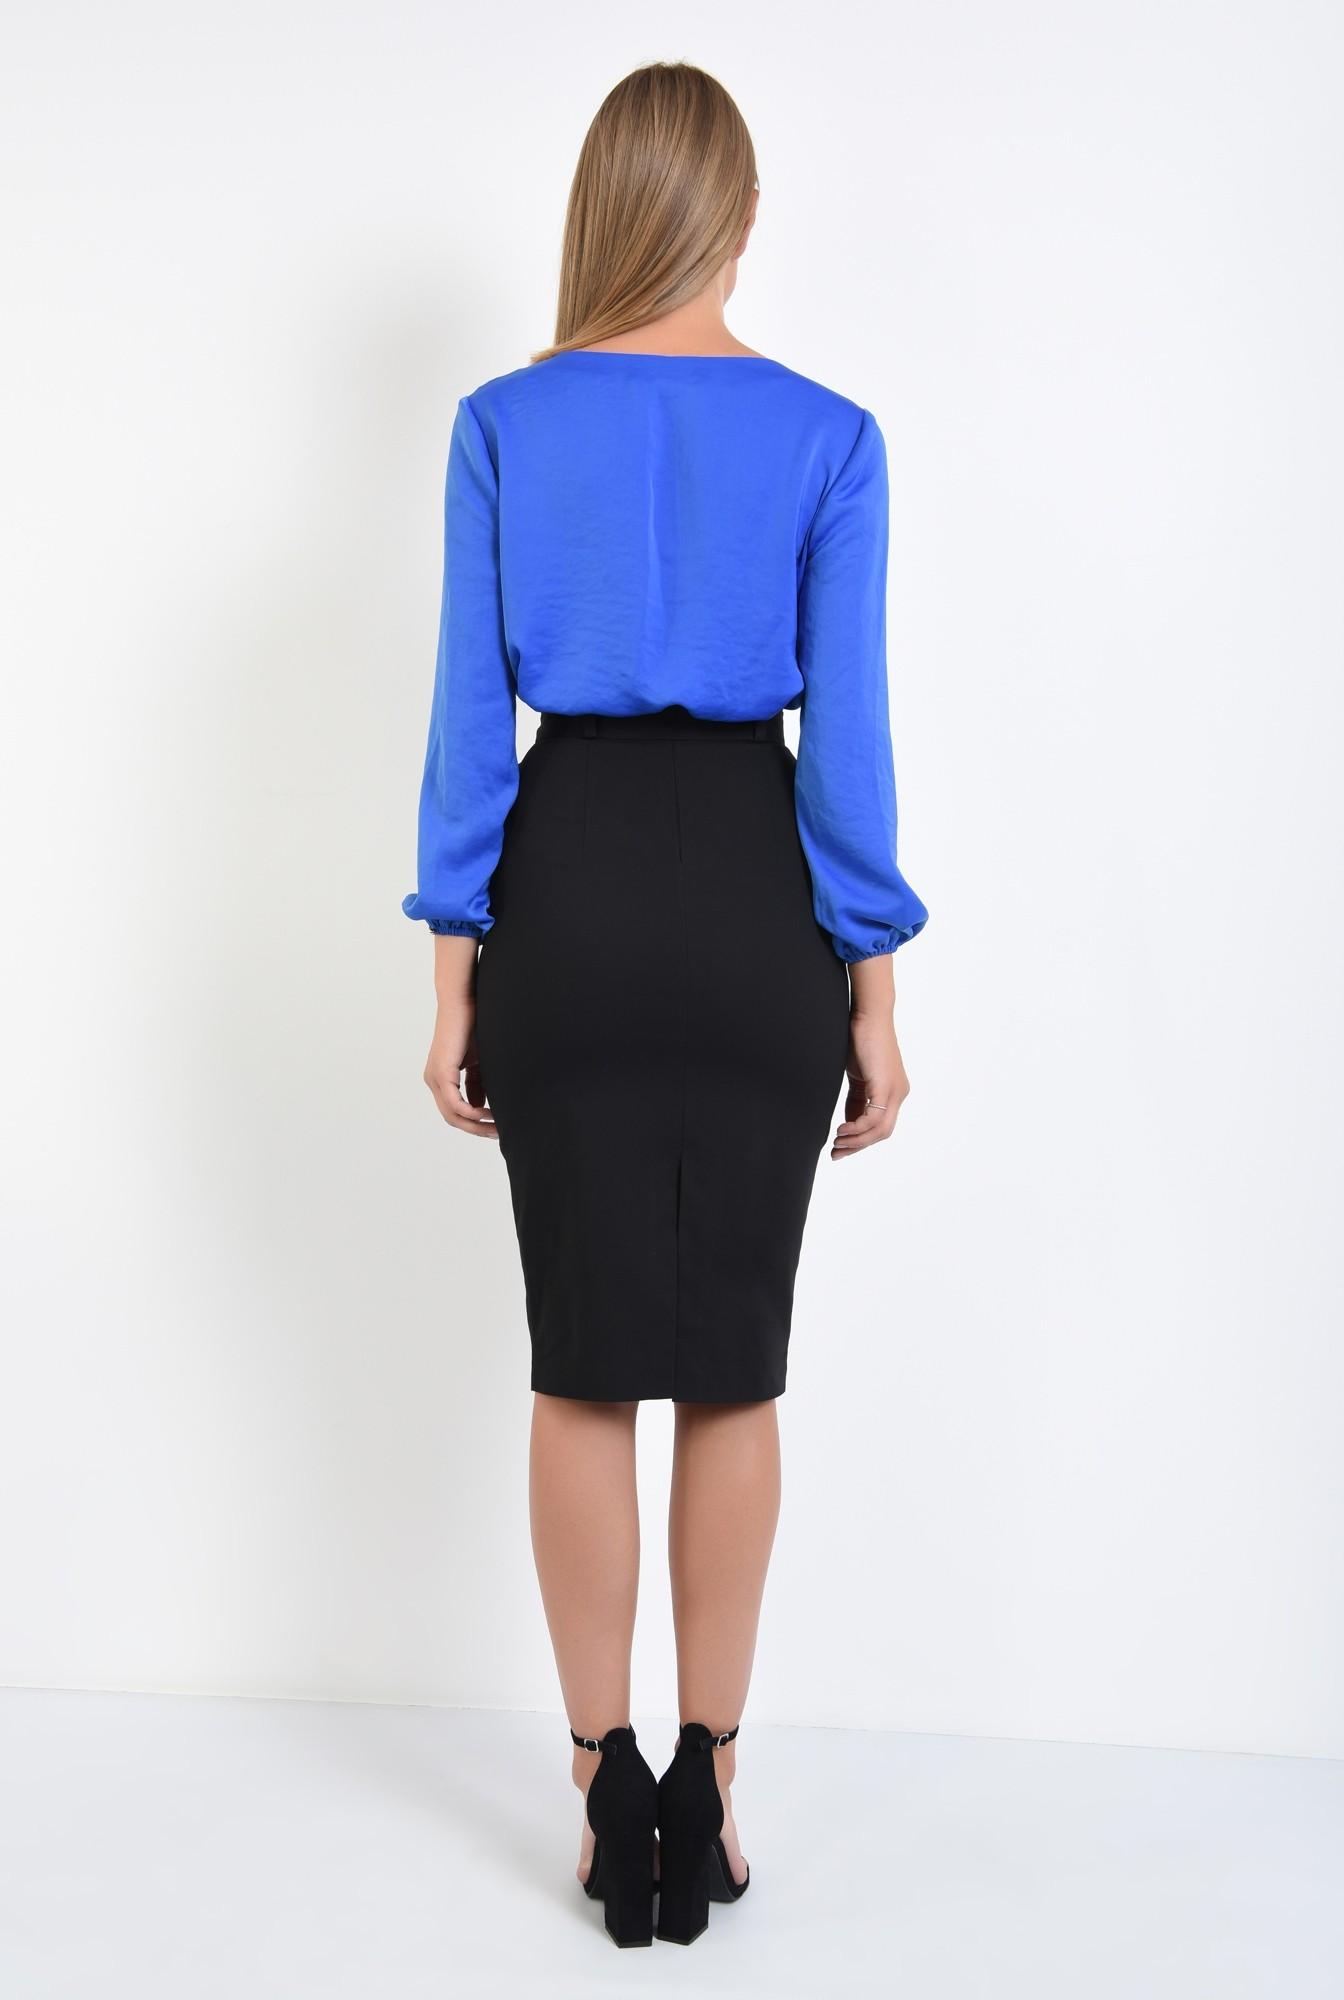 1 - bluza office cu anchior, tesatura satinata, bluze online